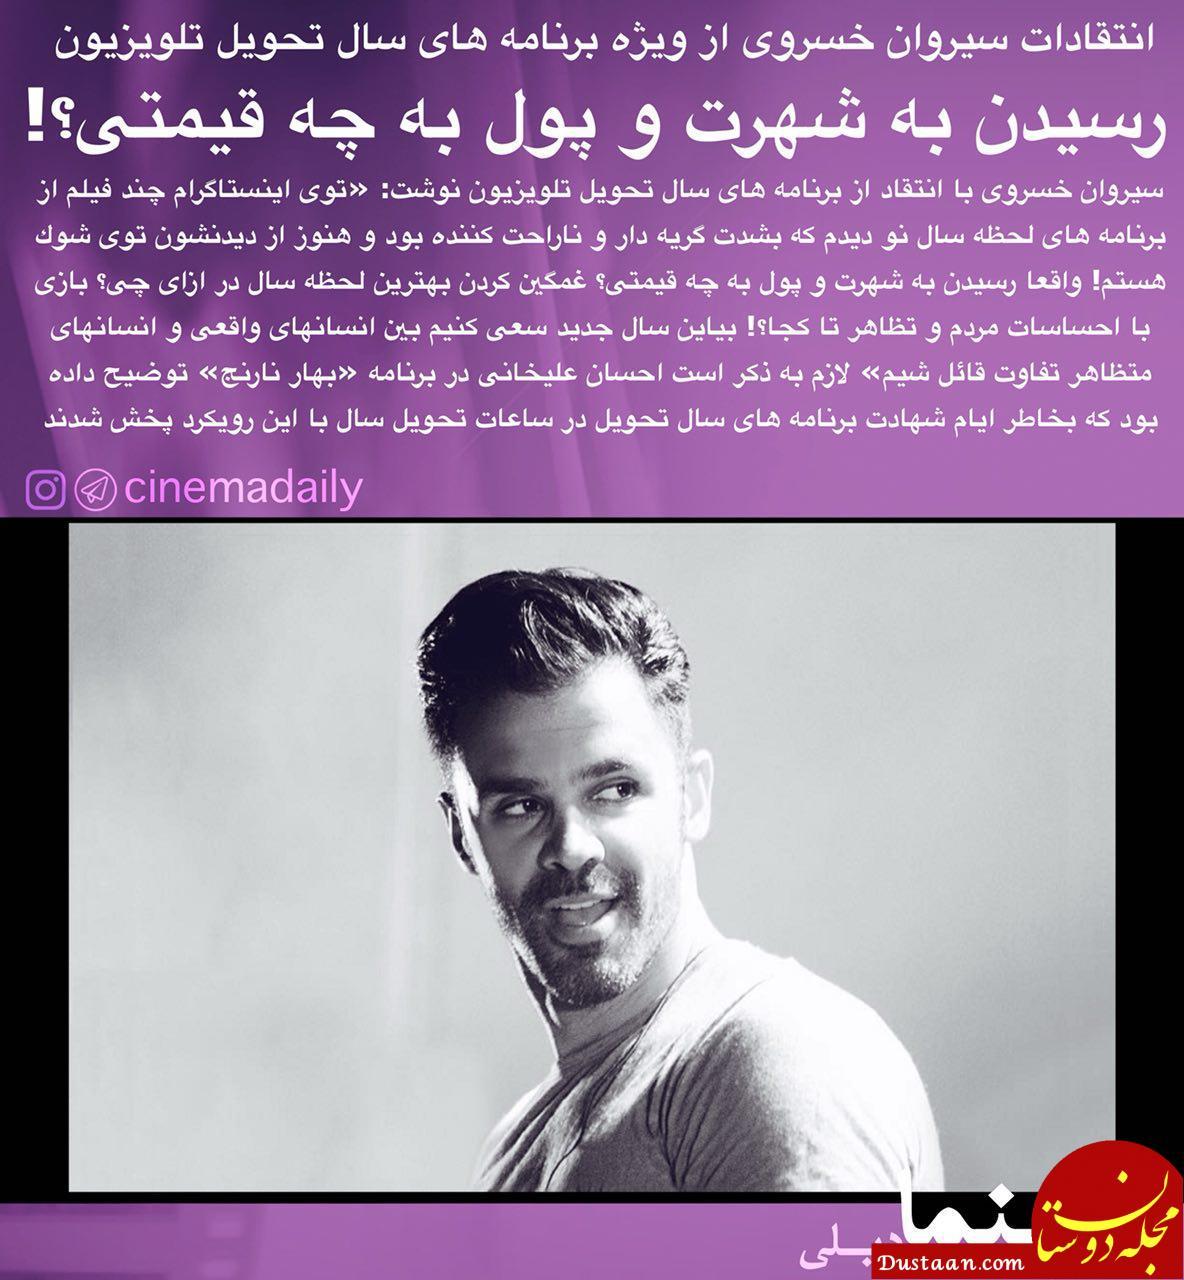 www.dustaan.com سیروان خسروی: رسیدن به پول و شهرت به چه قیمتی؟